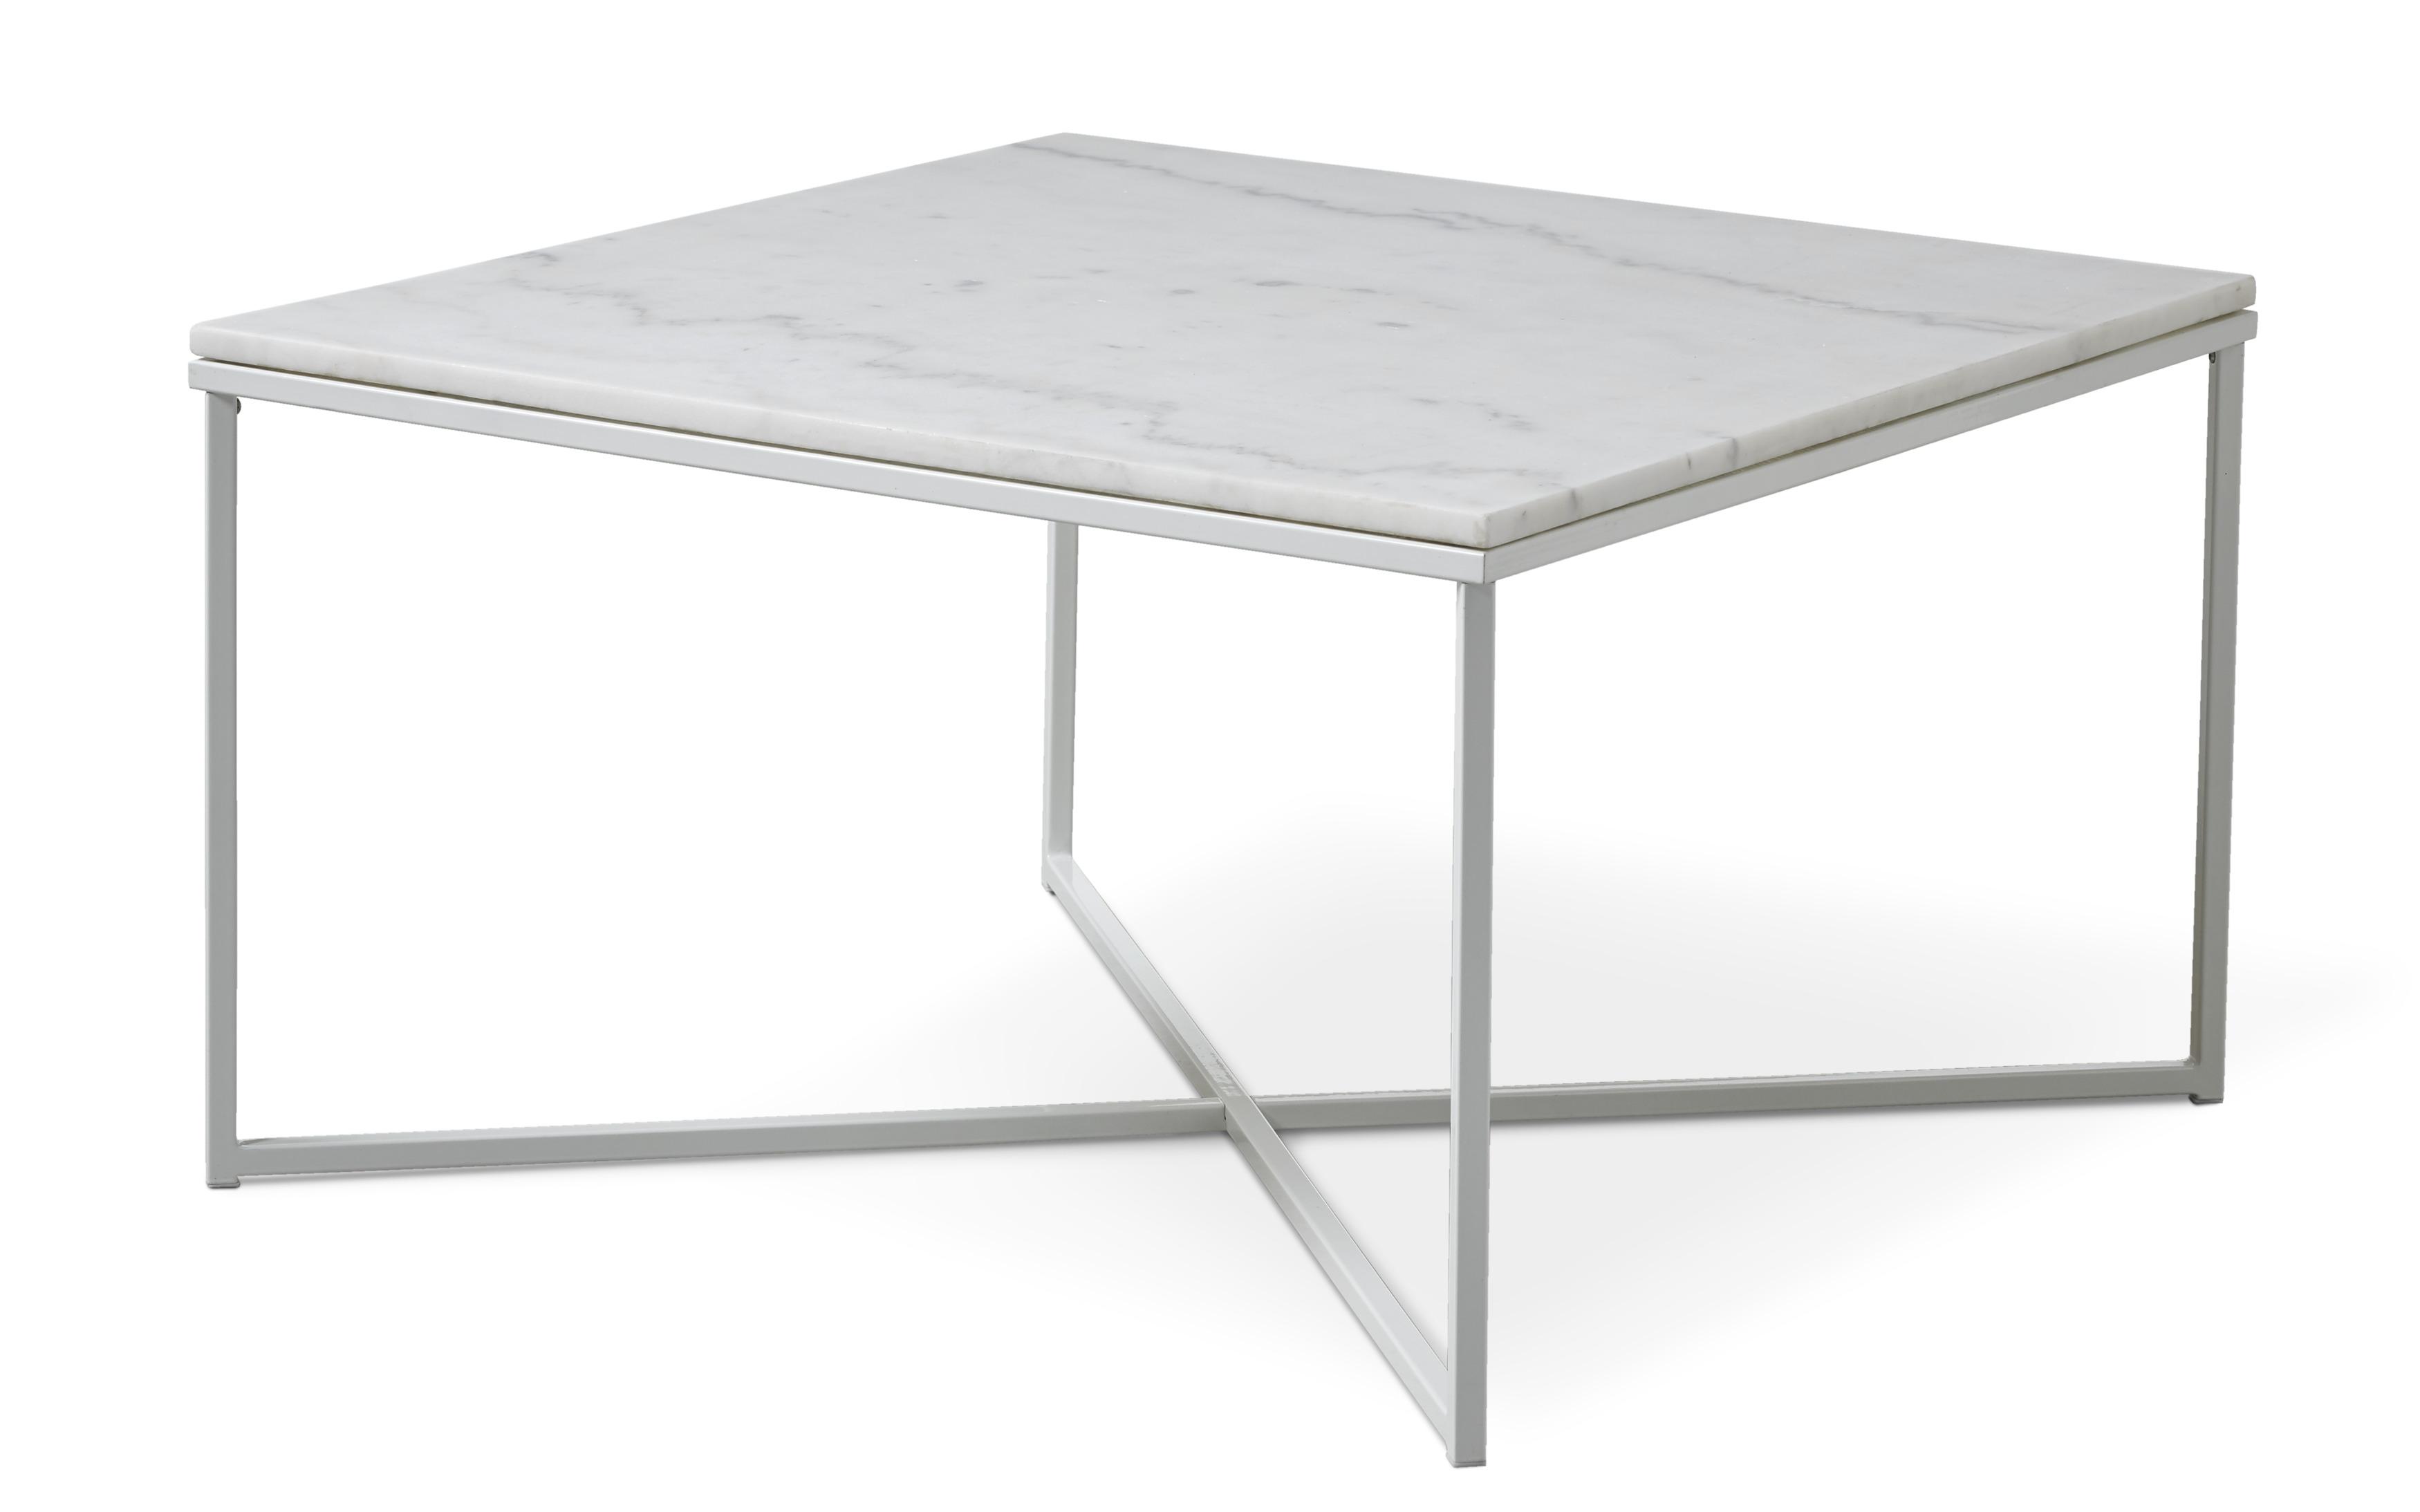 Novali Soffbord, L 80 cm | Soffbord | Mio | Soffbord, Vit